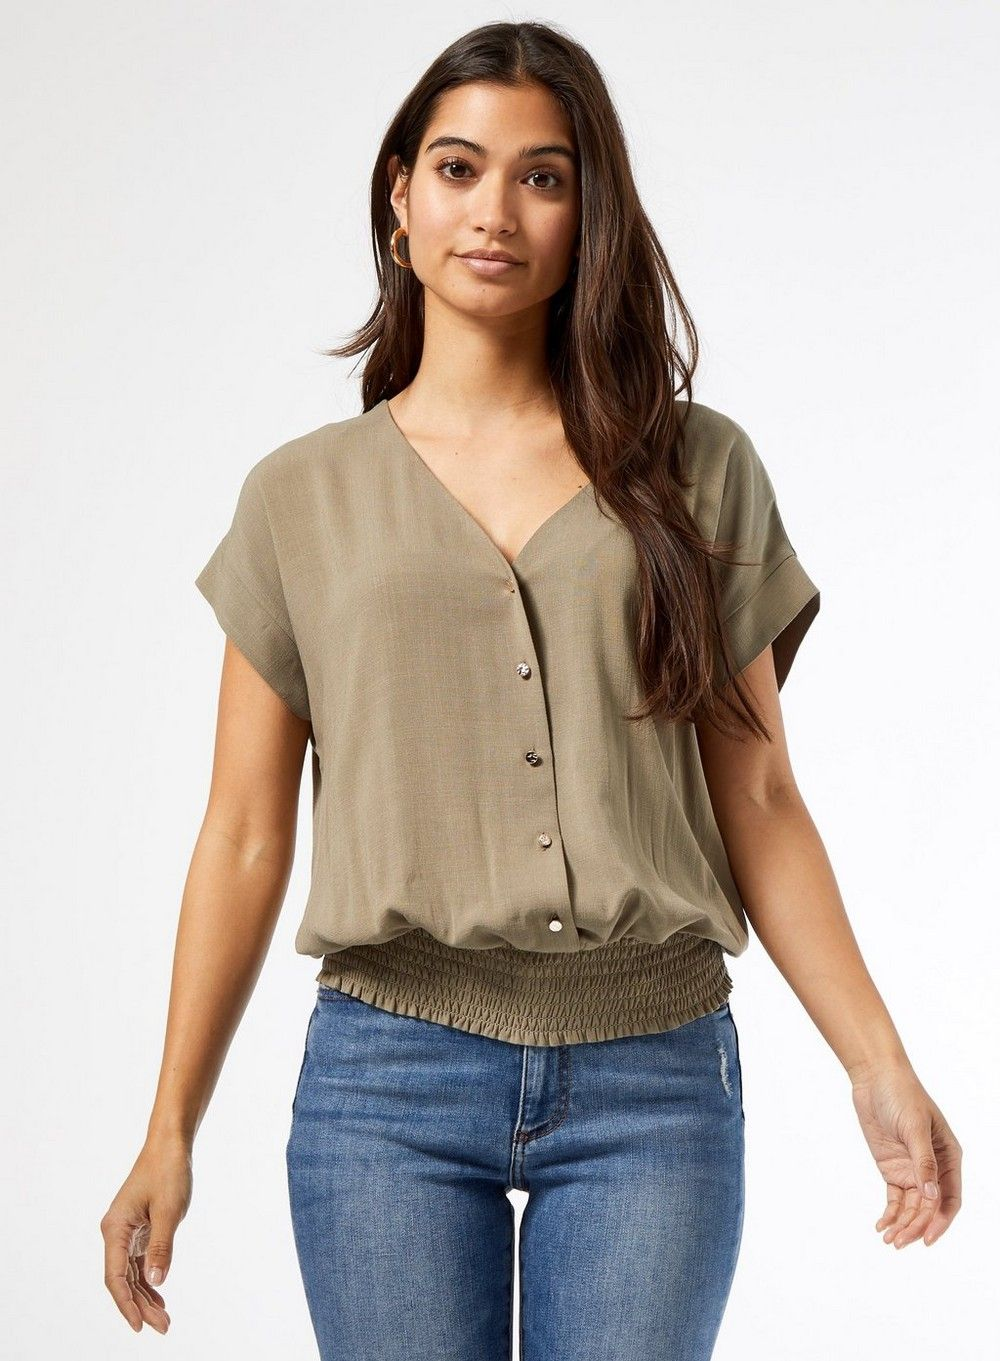 Dorothy Perkins Womens Petite Green Slub Button Top Blouse Short Sleeve